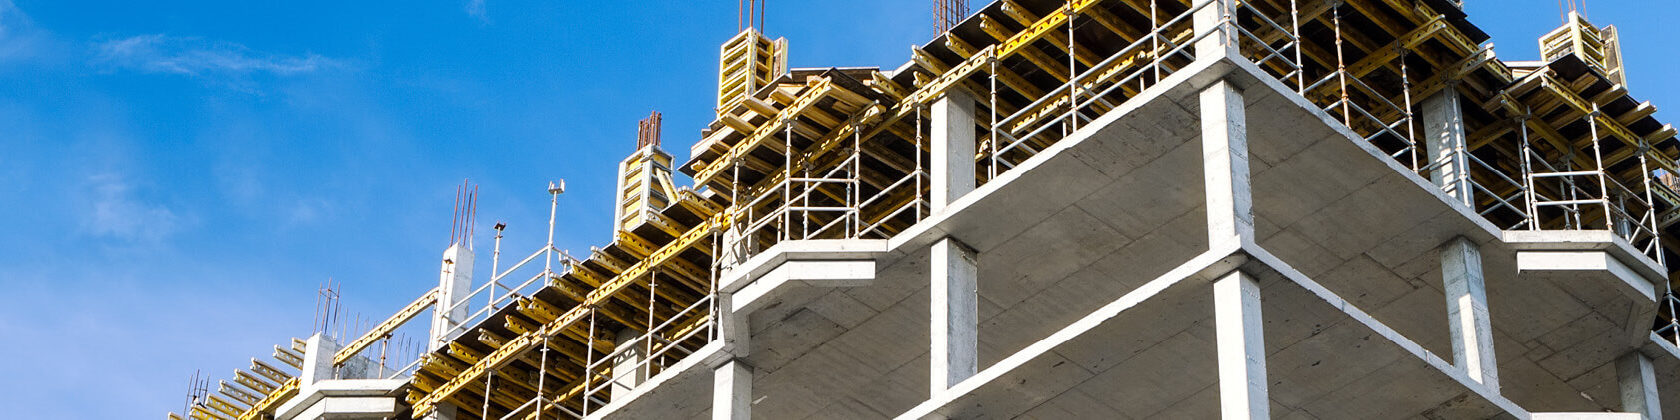 Charterland construction